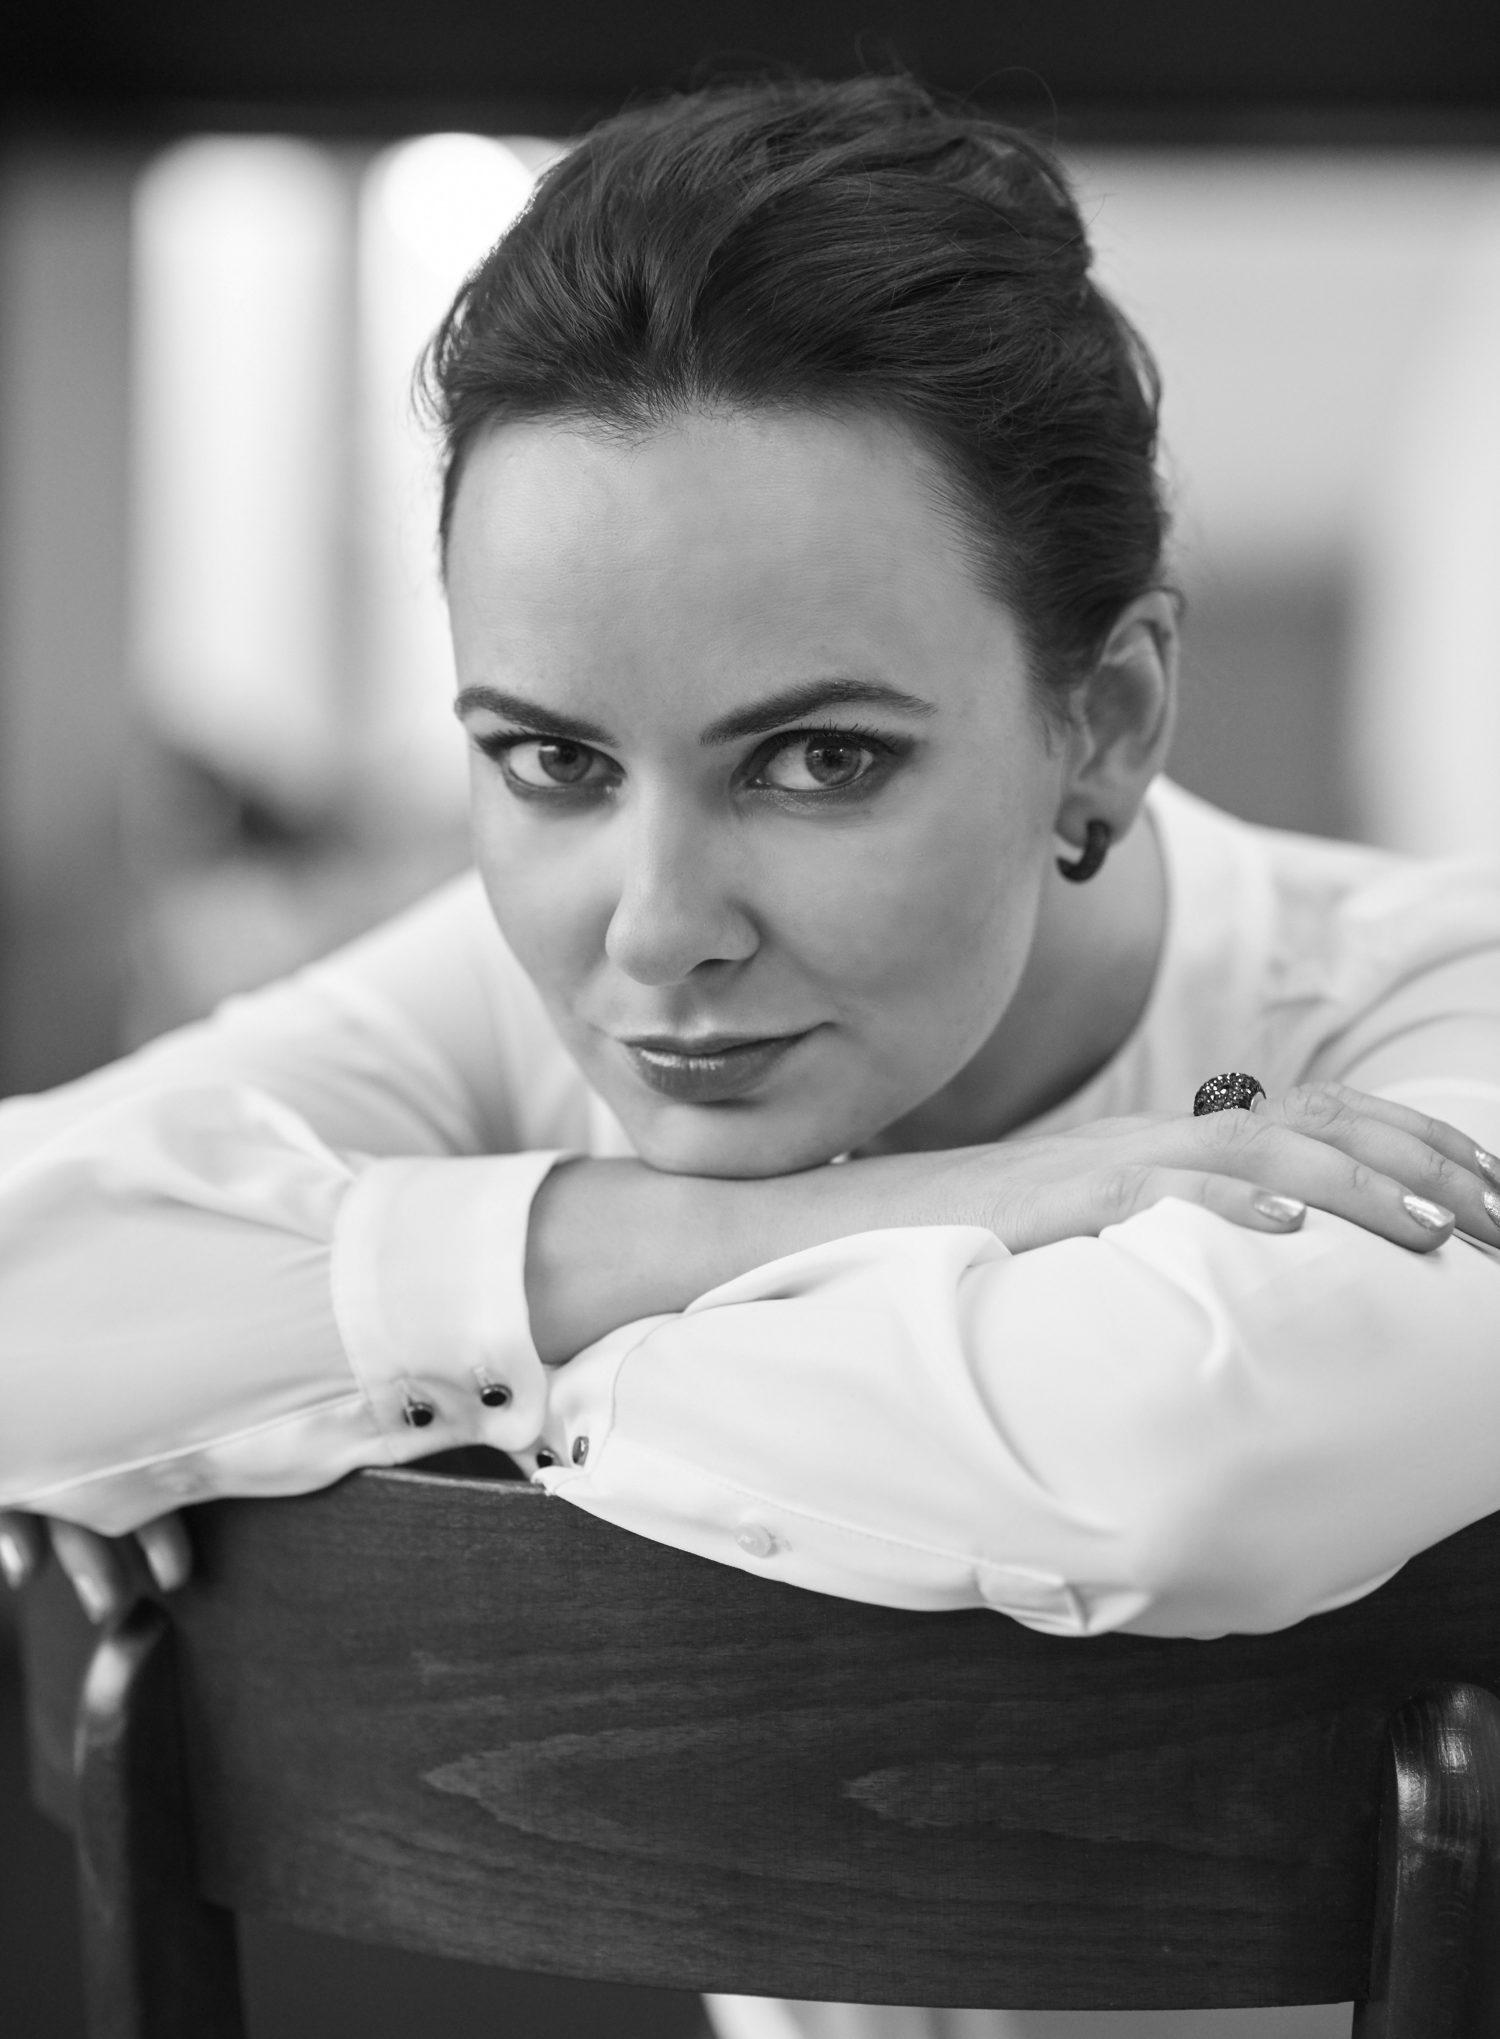 Anna Goryachova